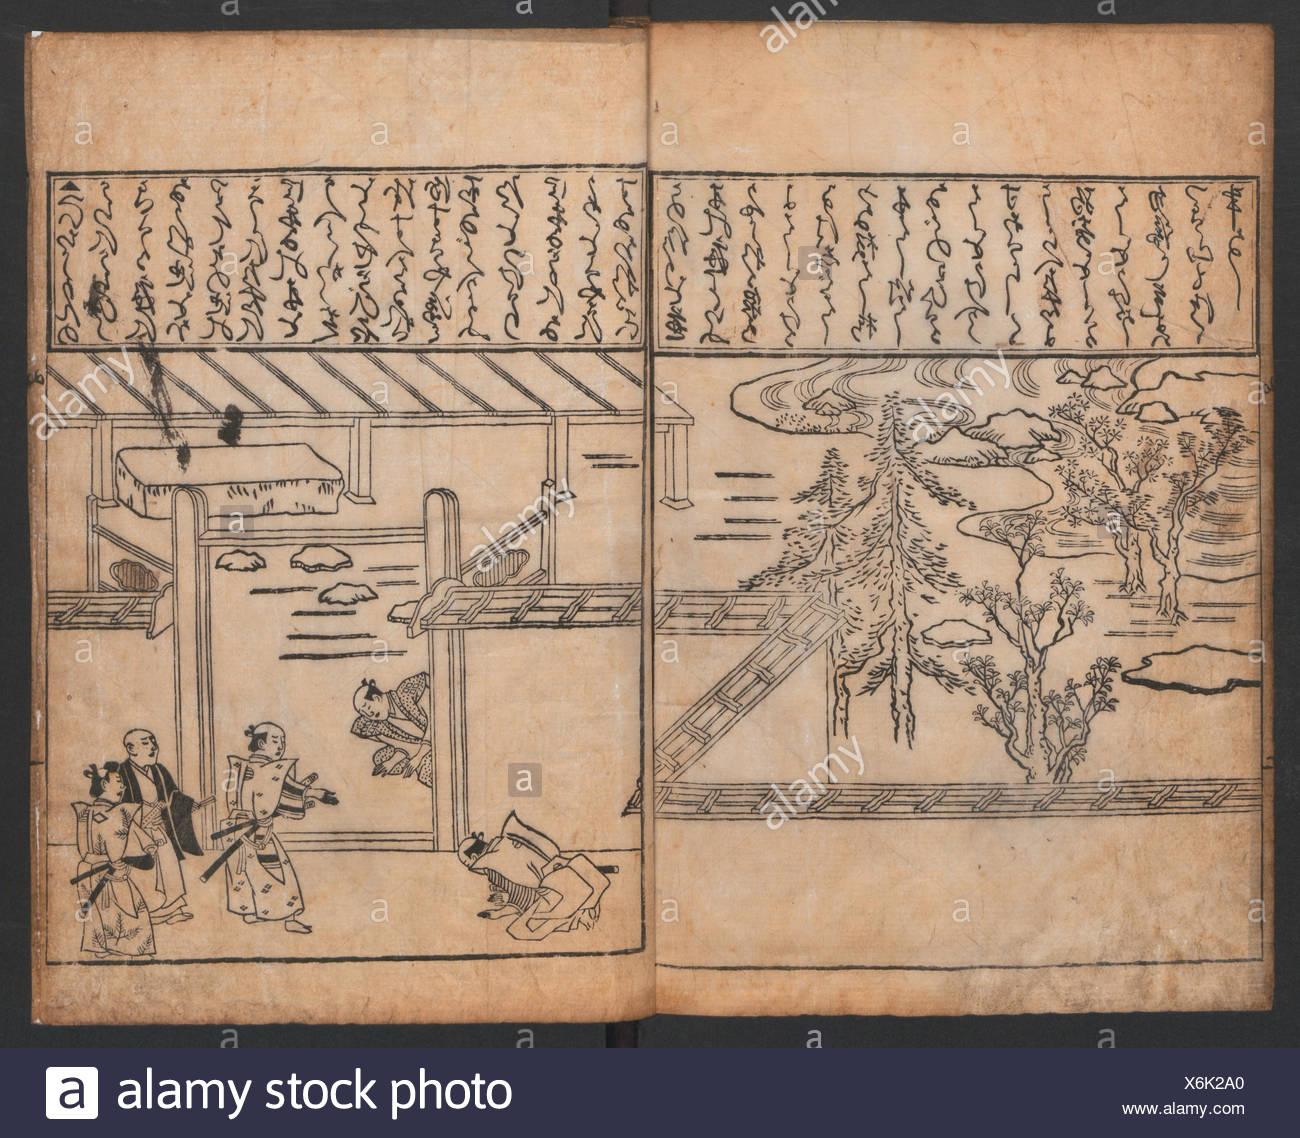 築山図庭画畫 余慶作り庭の図/A Compendium of Model Gardens (Tsukiyama no zu niwa zukushi; Yokei tsukuri niwa no zu). Artist: Hishikawa - Stock Image